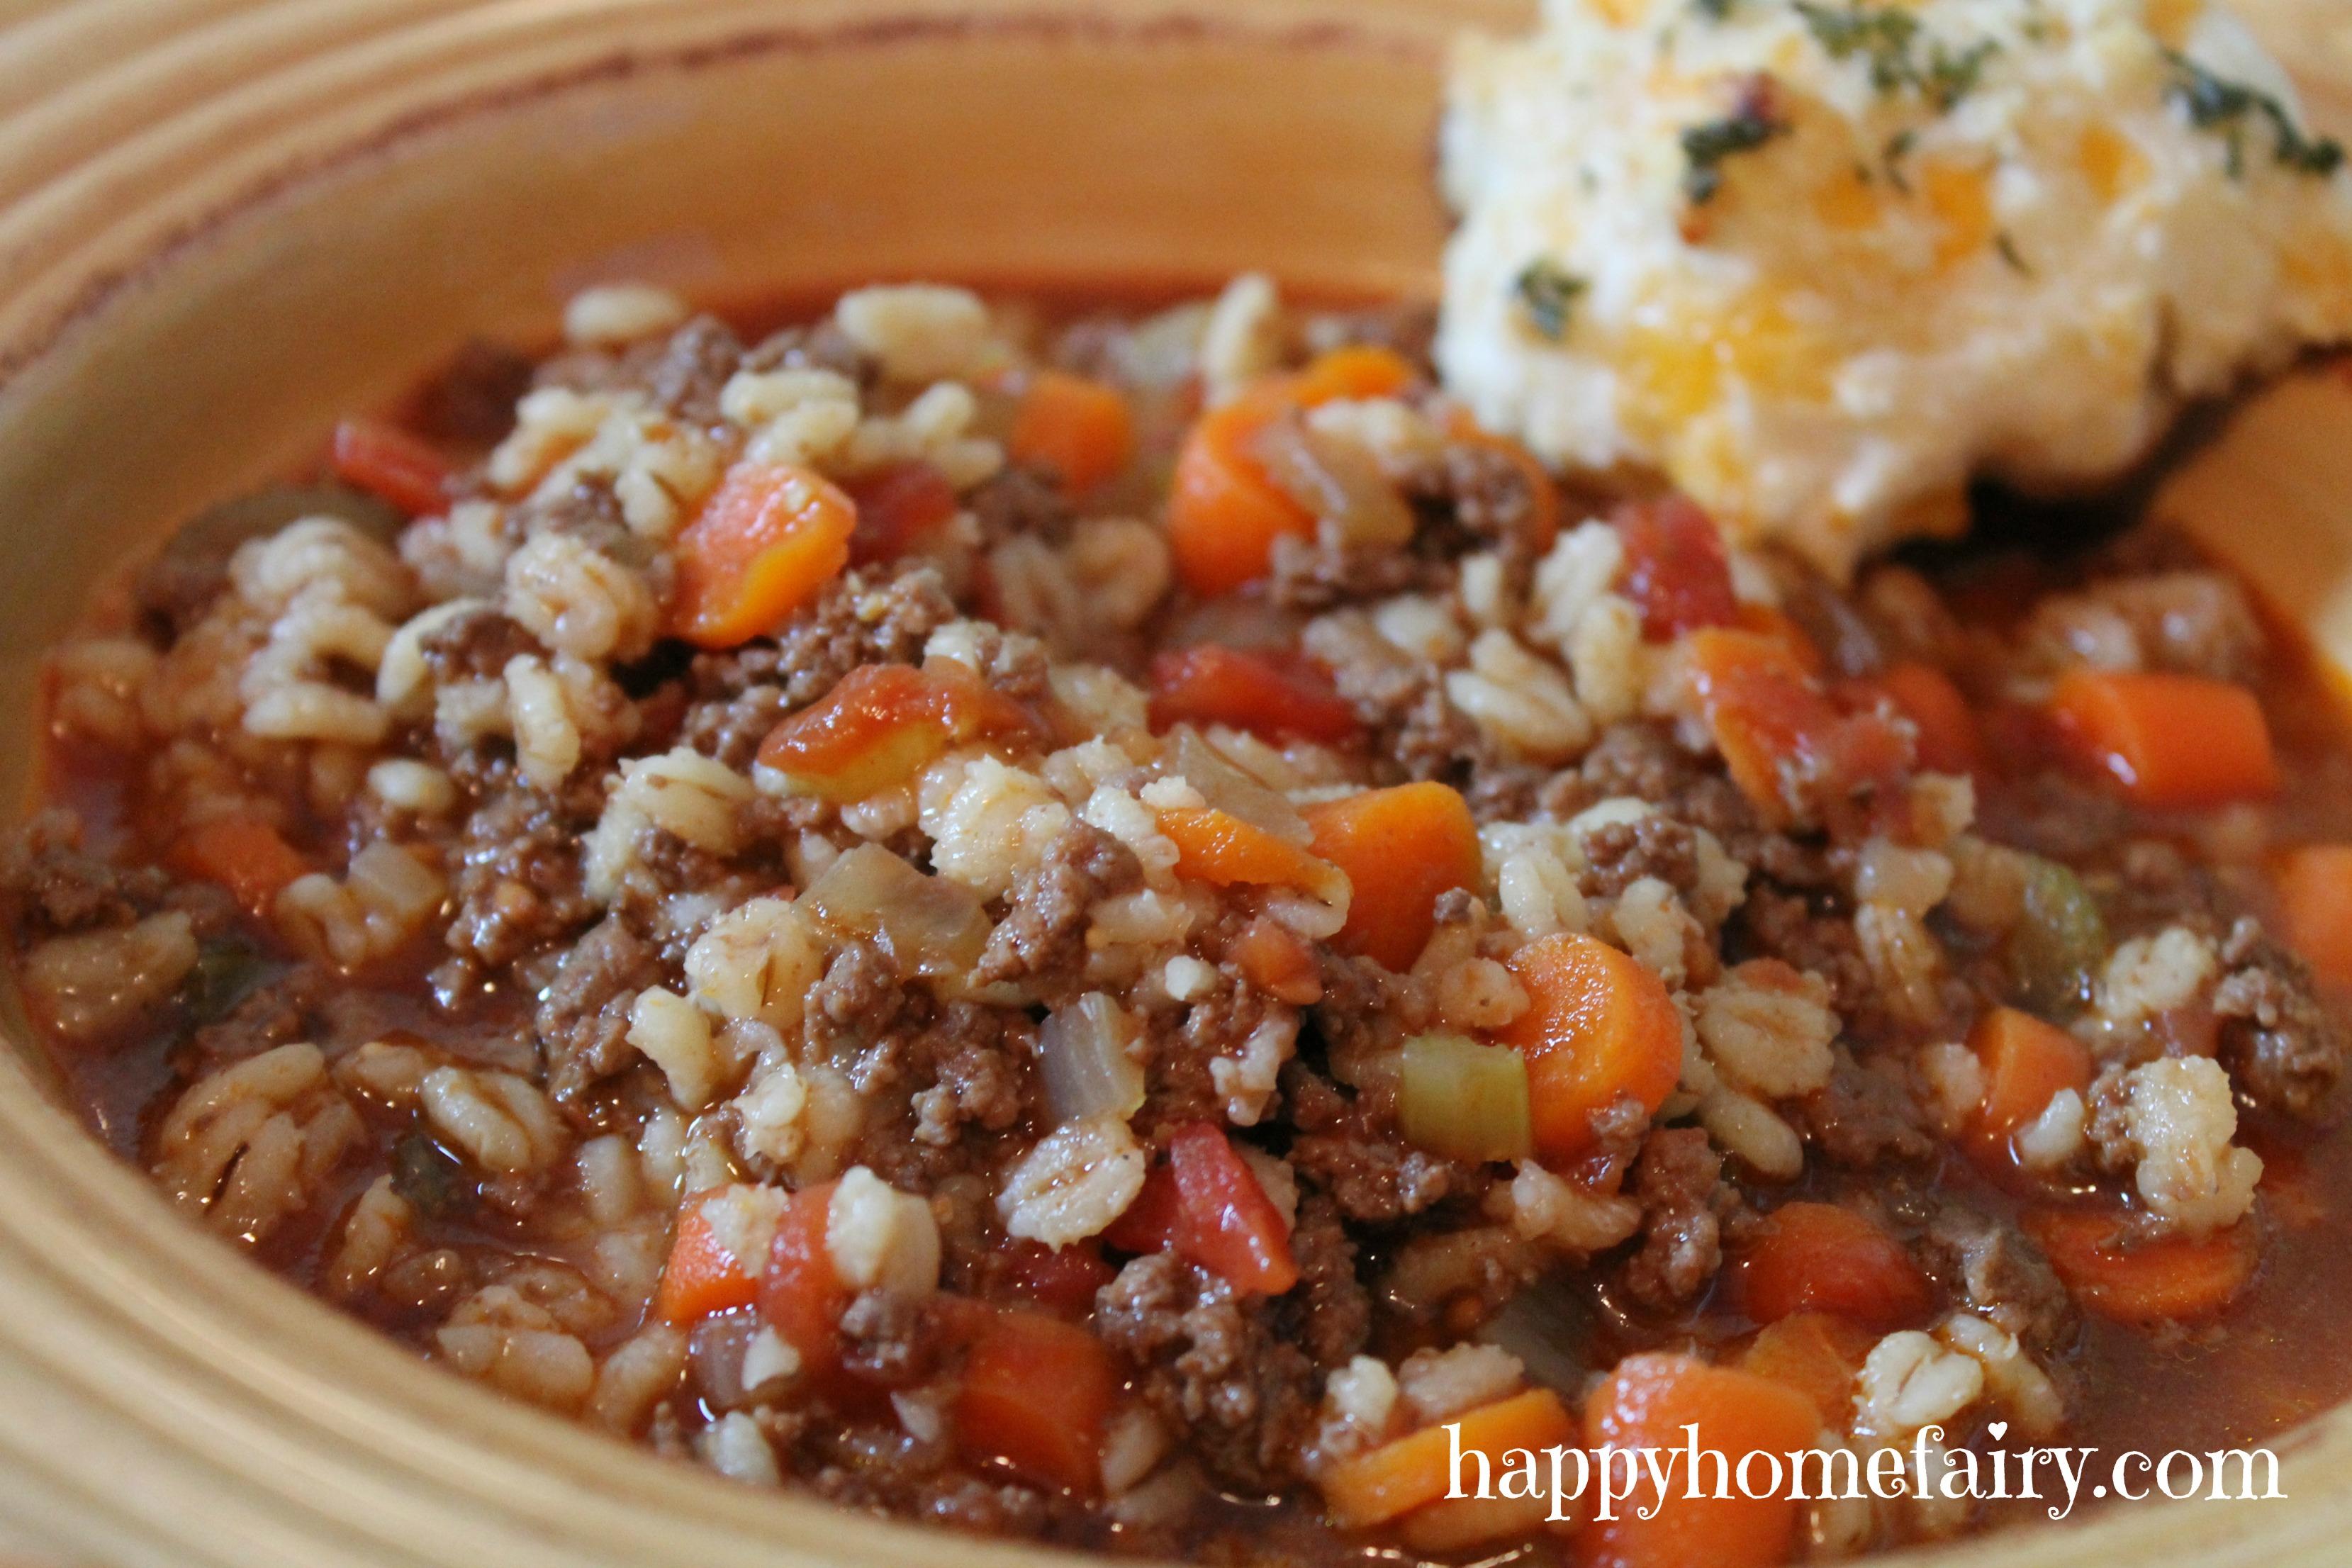 beef-barley-soup3-at-happyhomefairy-com1.jpg